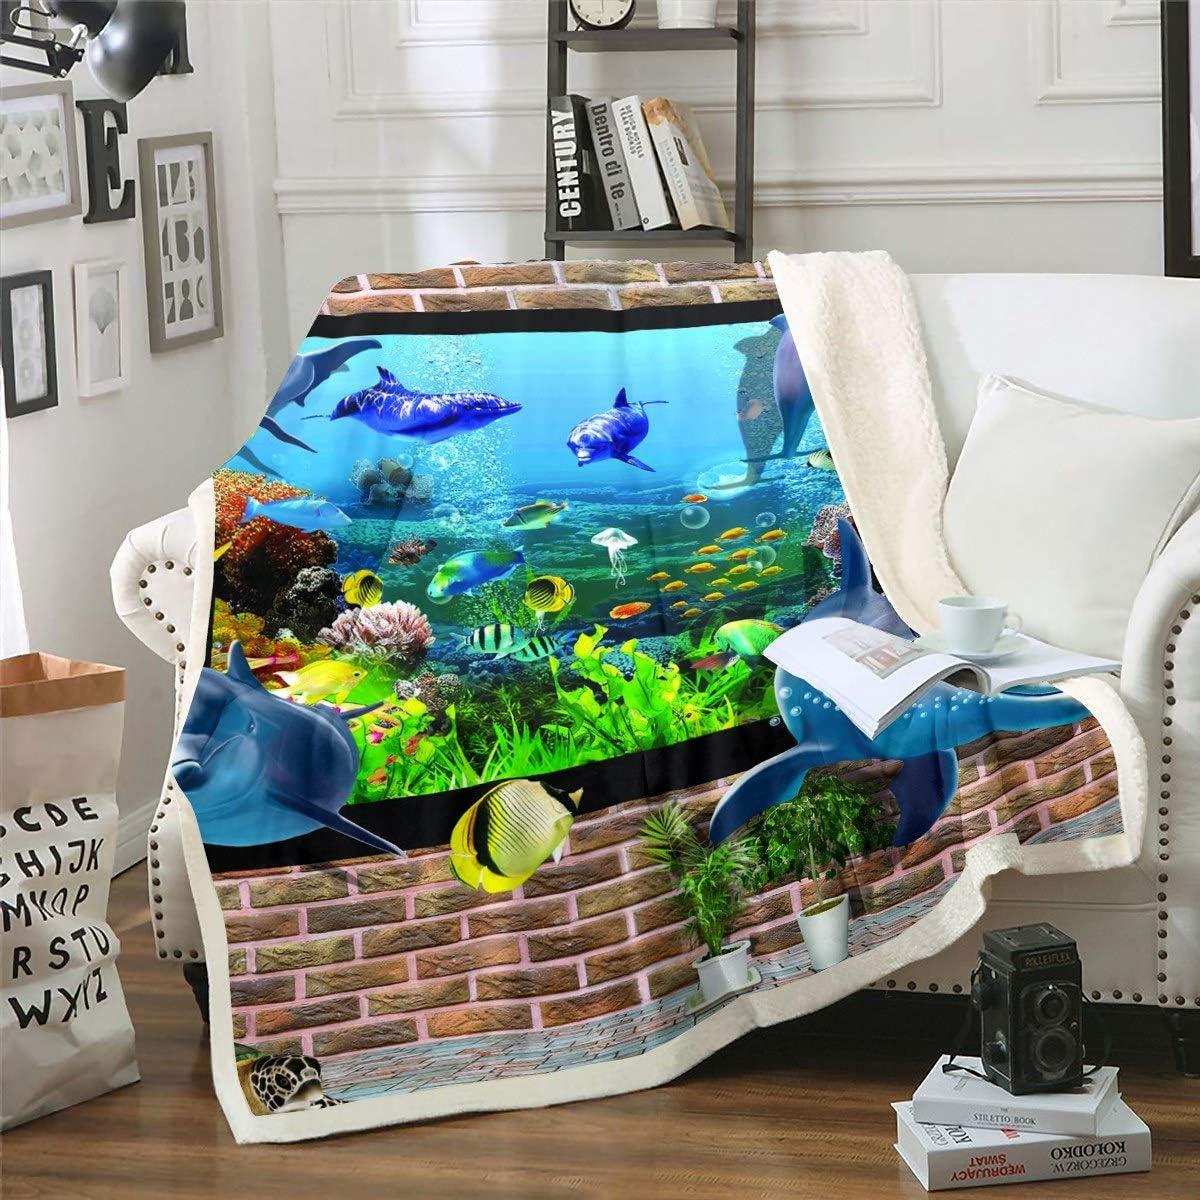 Dolphin Fleece Boston Mall Throw Blanket Marine Life 25% OFF Ocean Theme Animal Sher